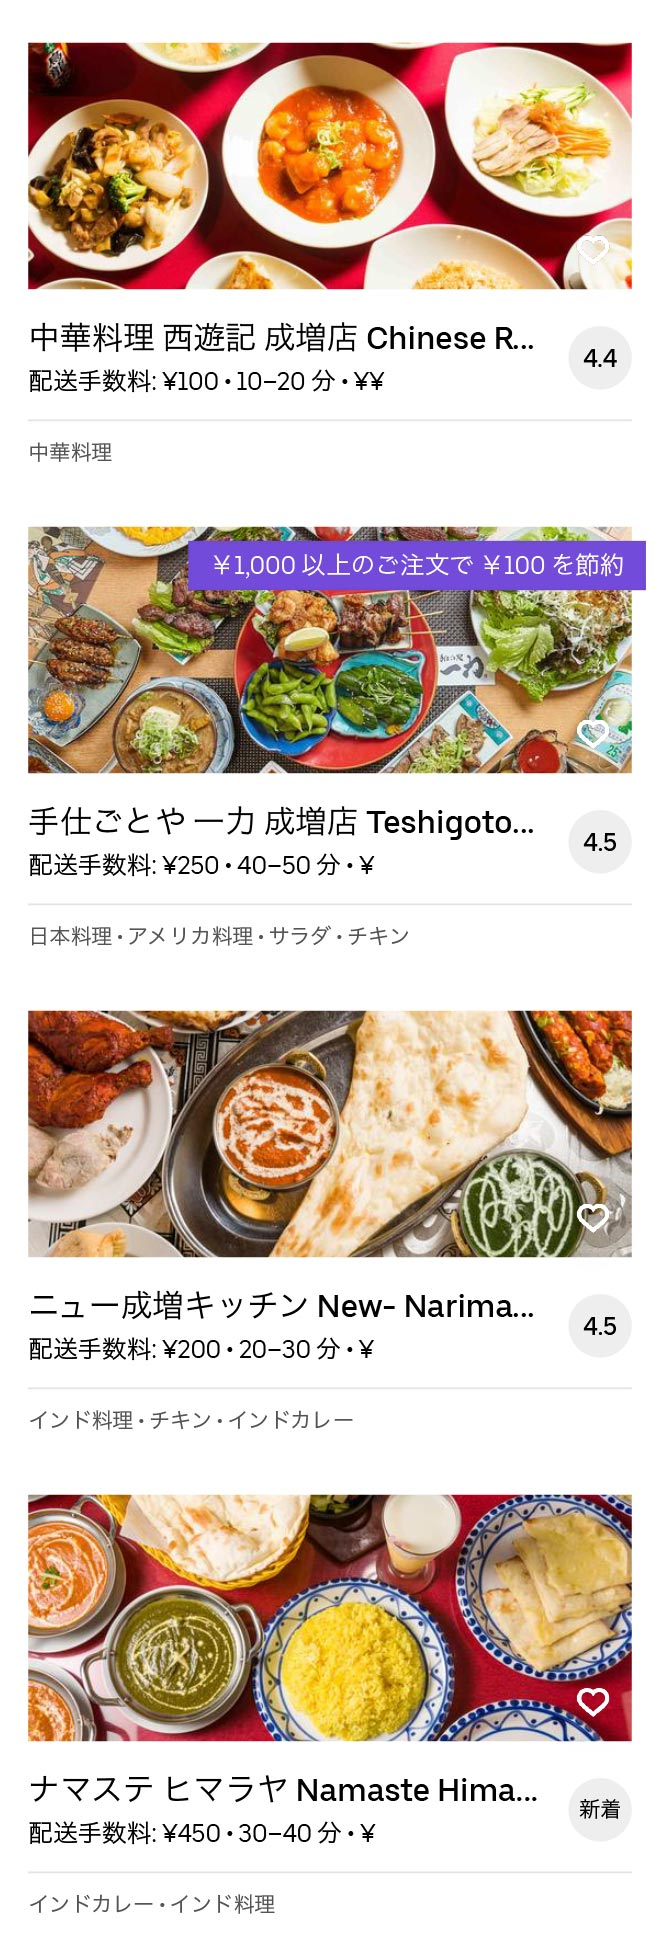 Saitama wako menu 2004 08